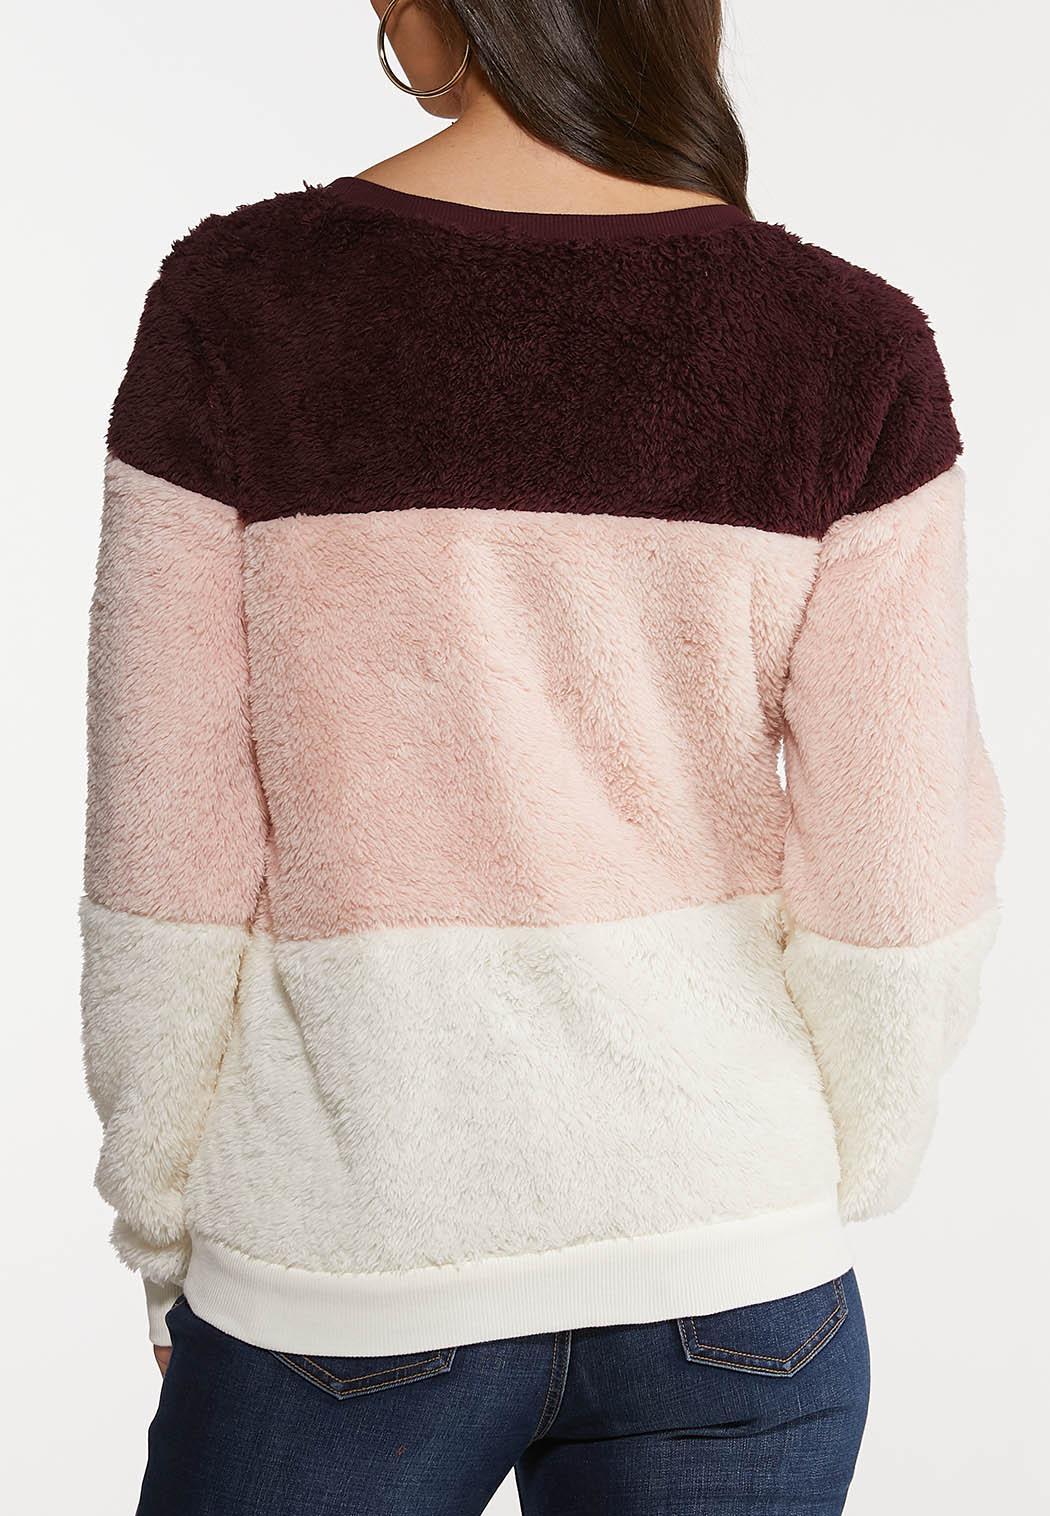 Colorblock Fleece Top (Item #44089108)